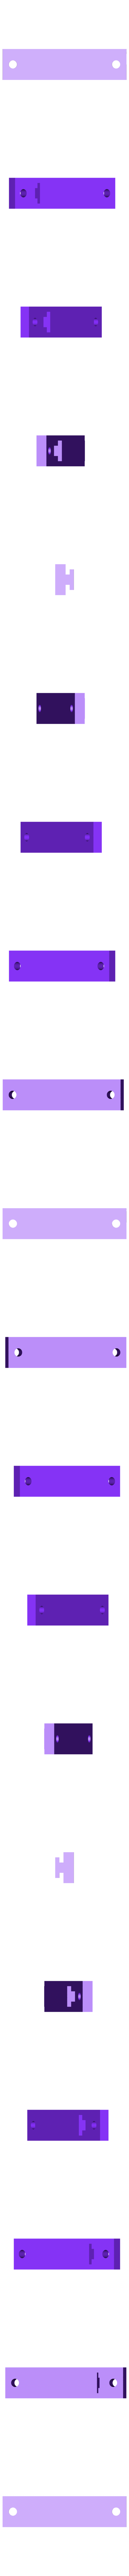 pièce JP.stl Download free STL file Baseboard mounting bracket (tube feet) • 3D printable template, diver2002